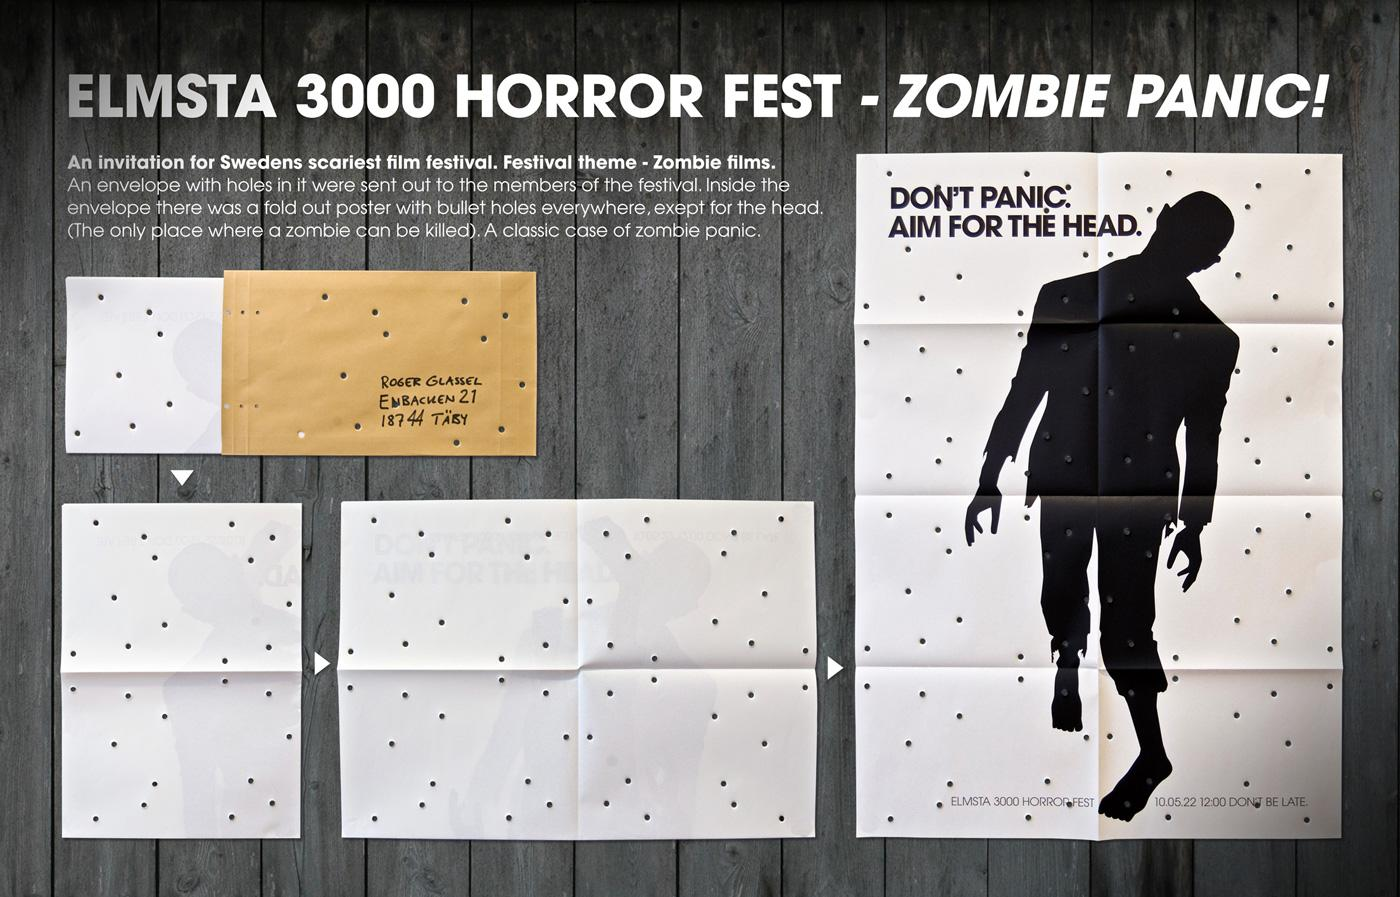 ELMSTA-3000_zombiepanic_eng.jpg